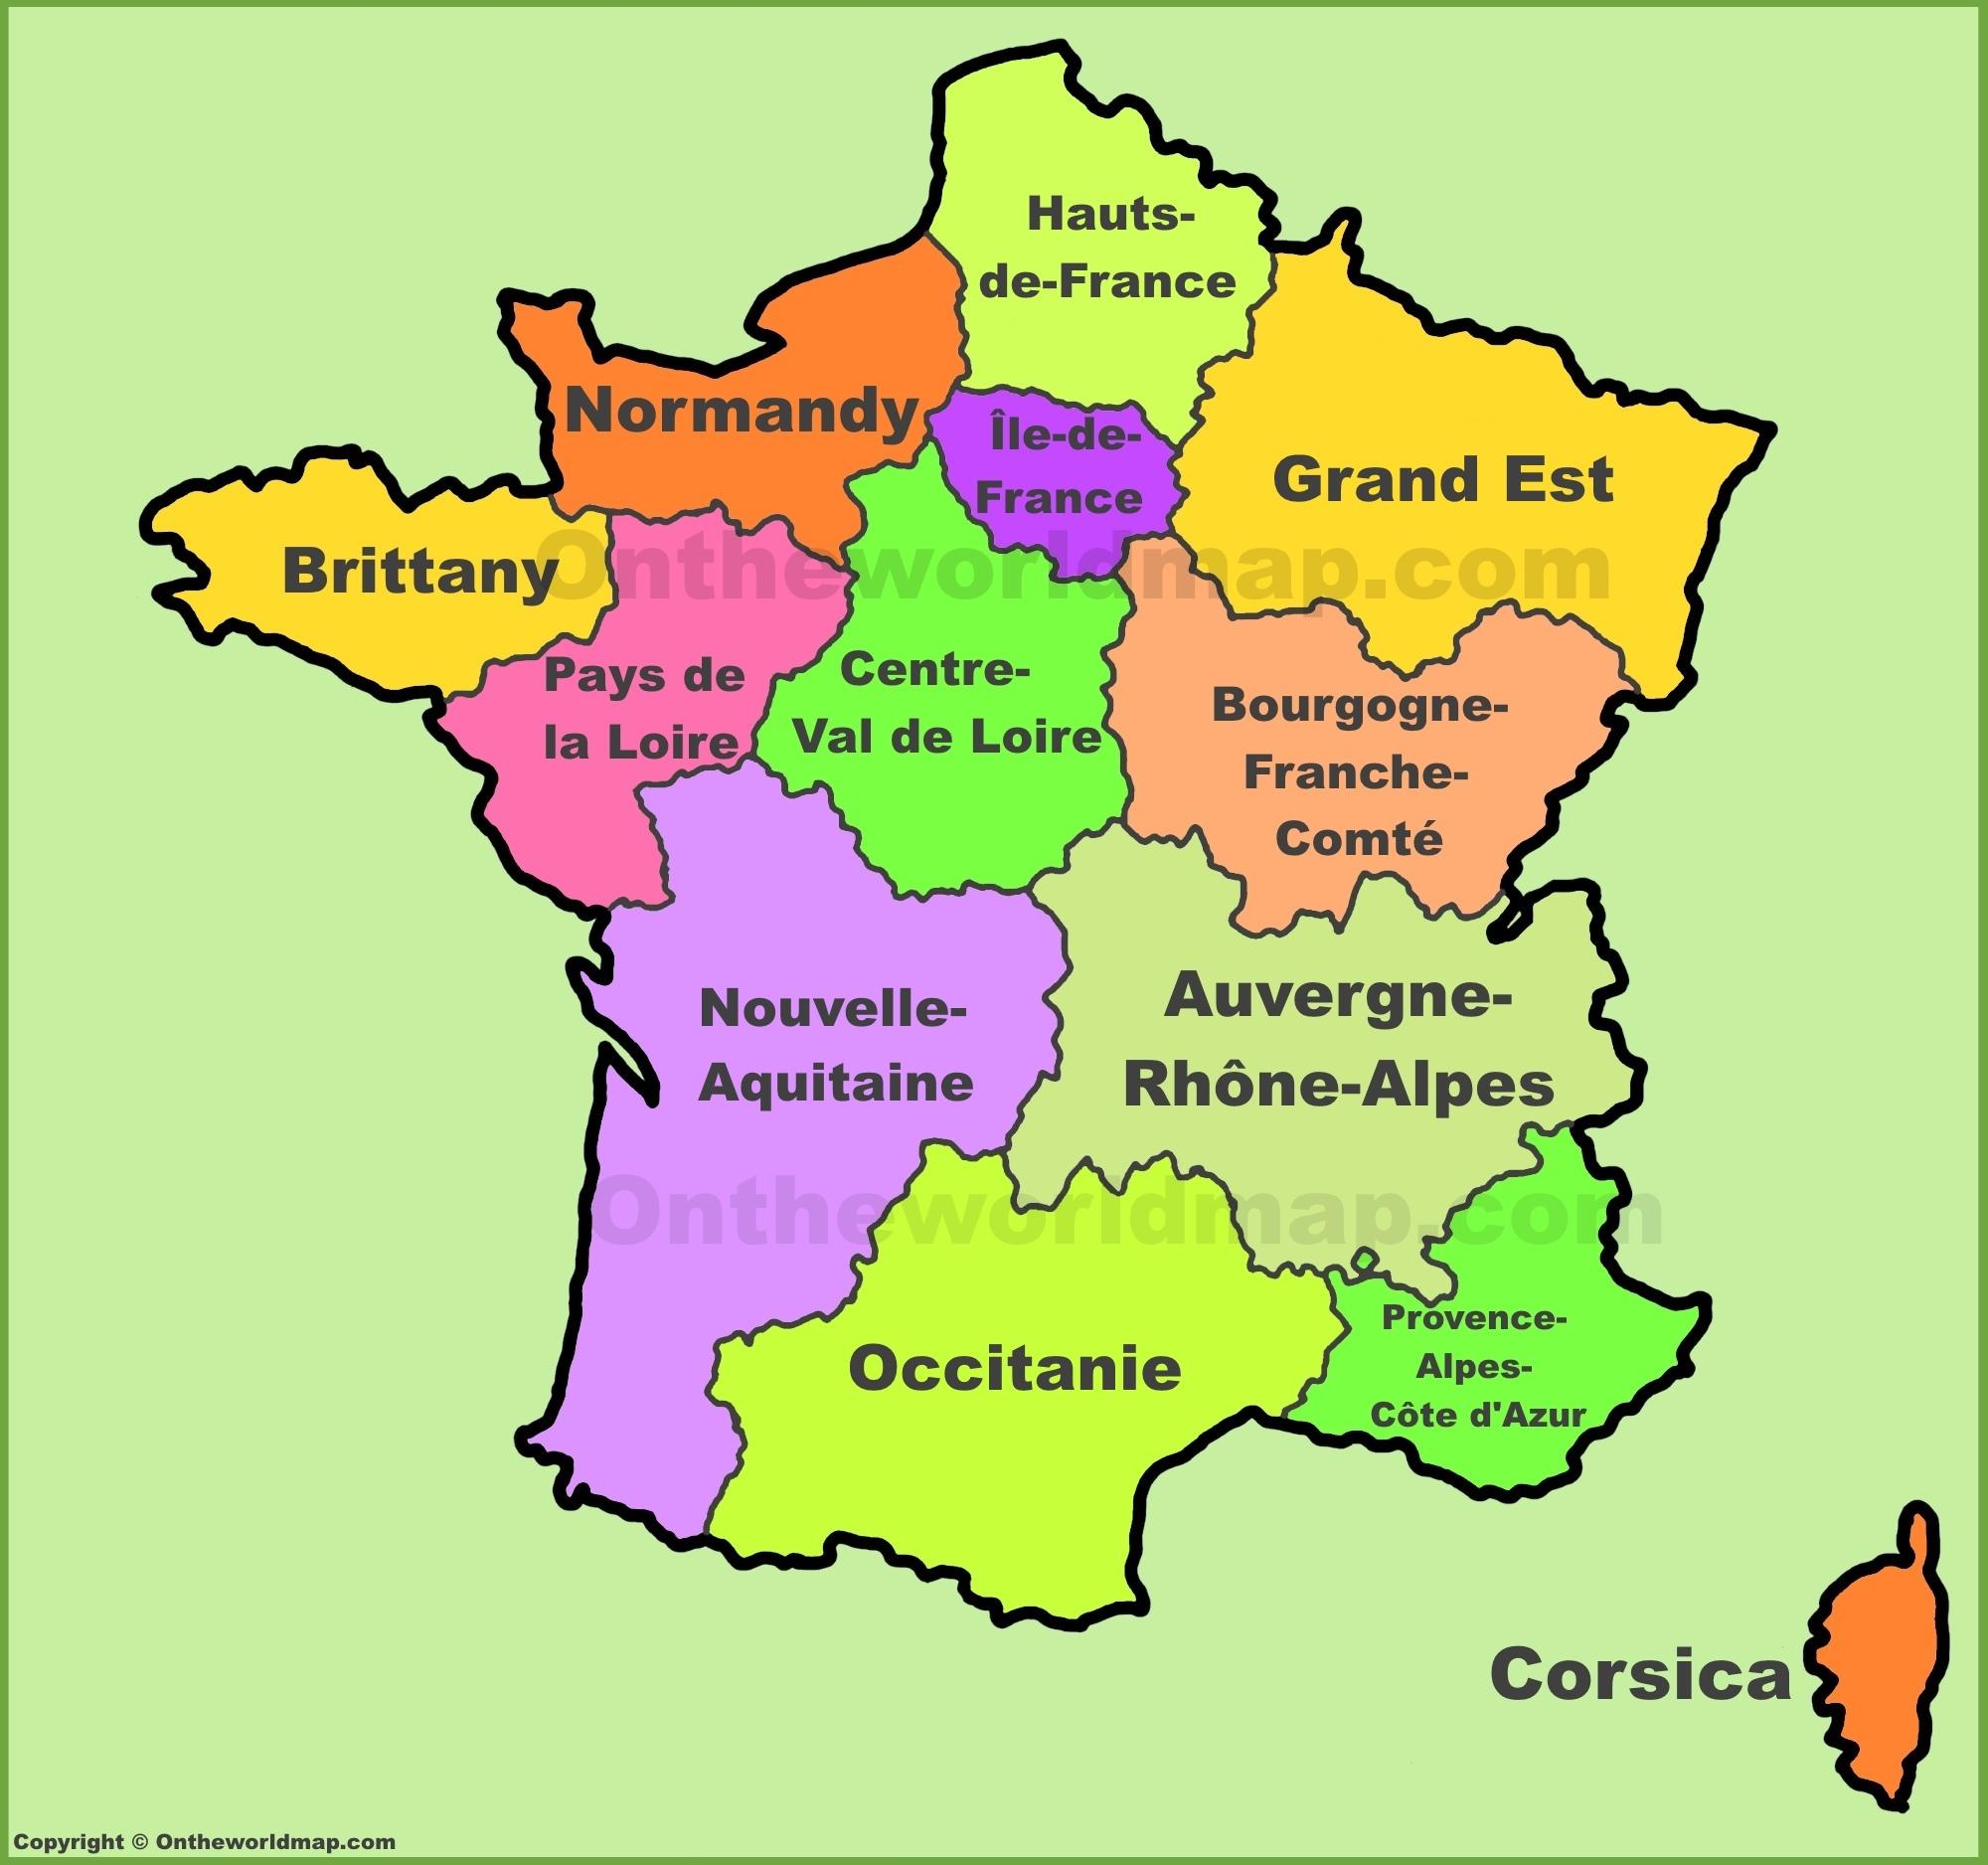 France Regions Map France regions map | New regions of France France Regions Map